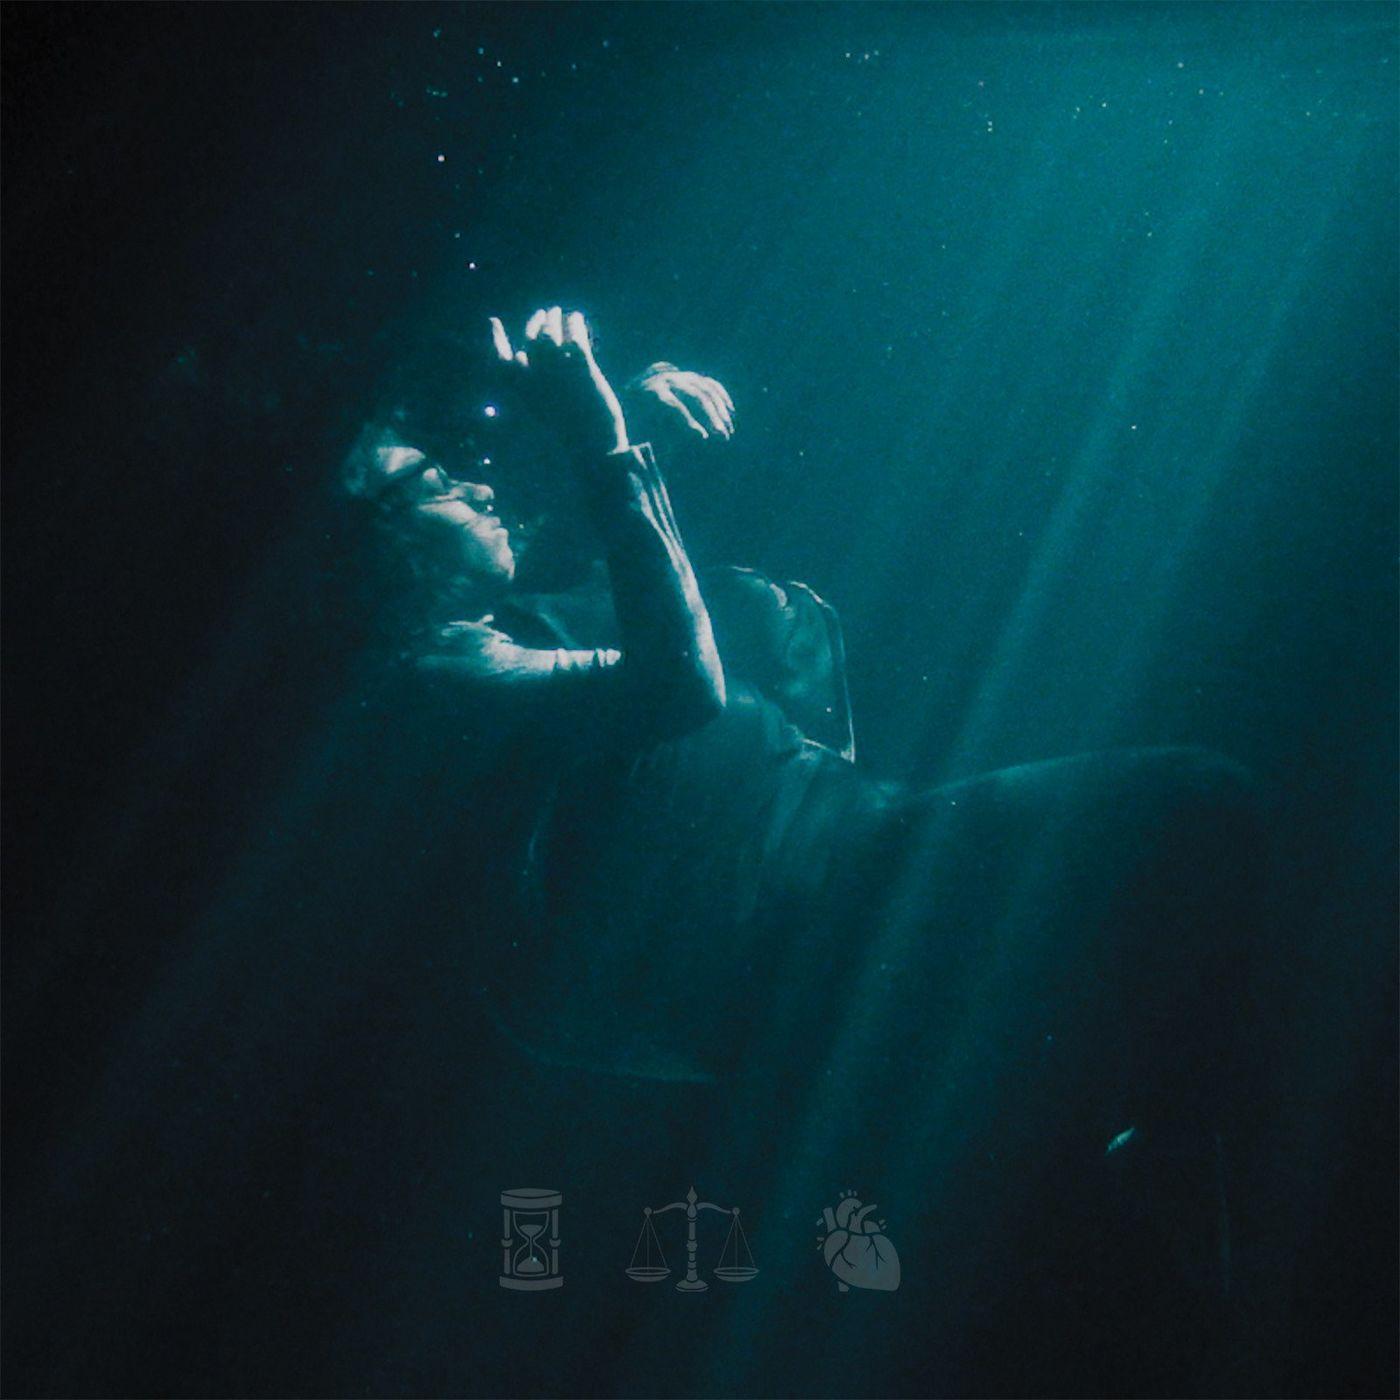 Defences - Something More [single] (2021)